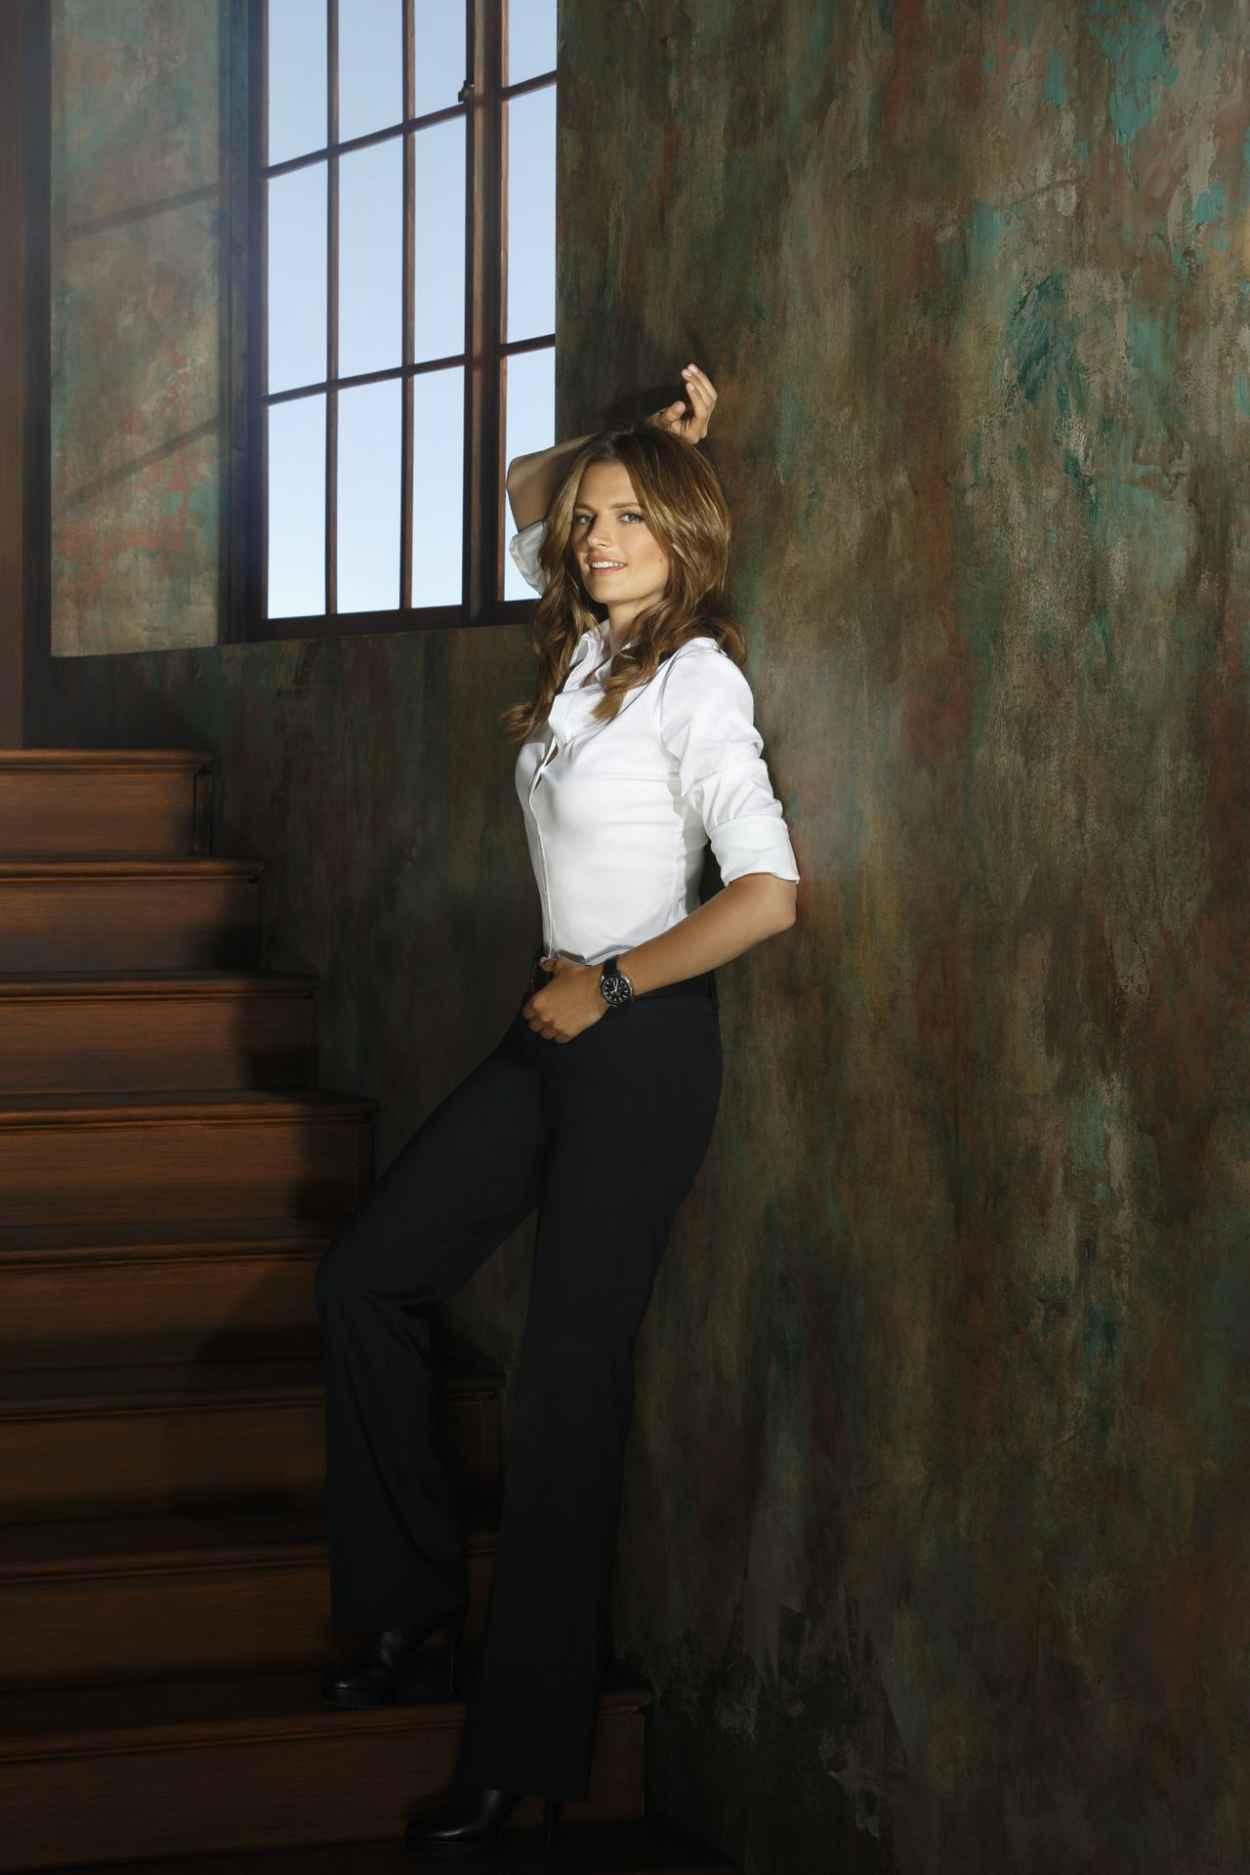 Stana Katic Promoshoot for Castle Season 6-1